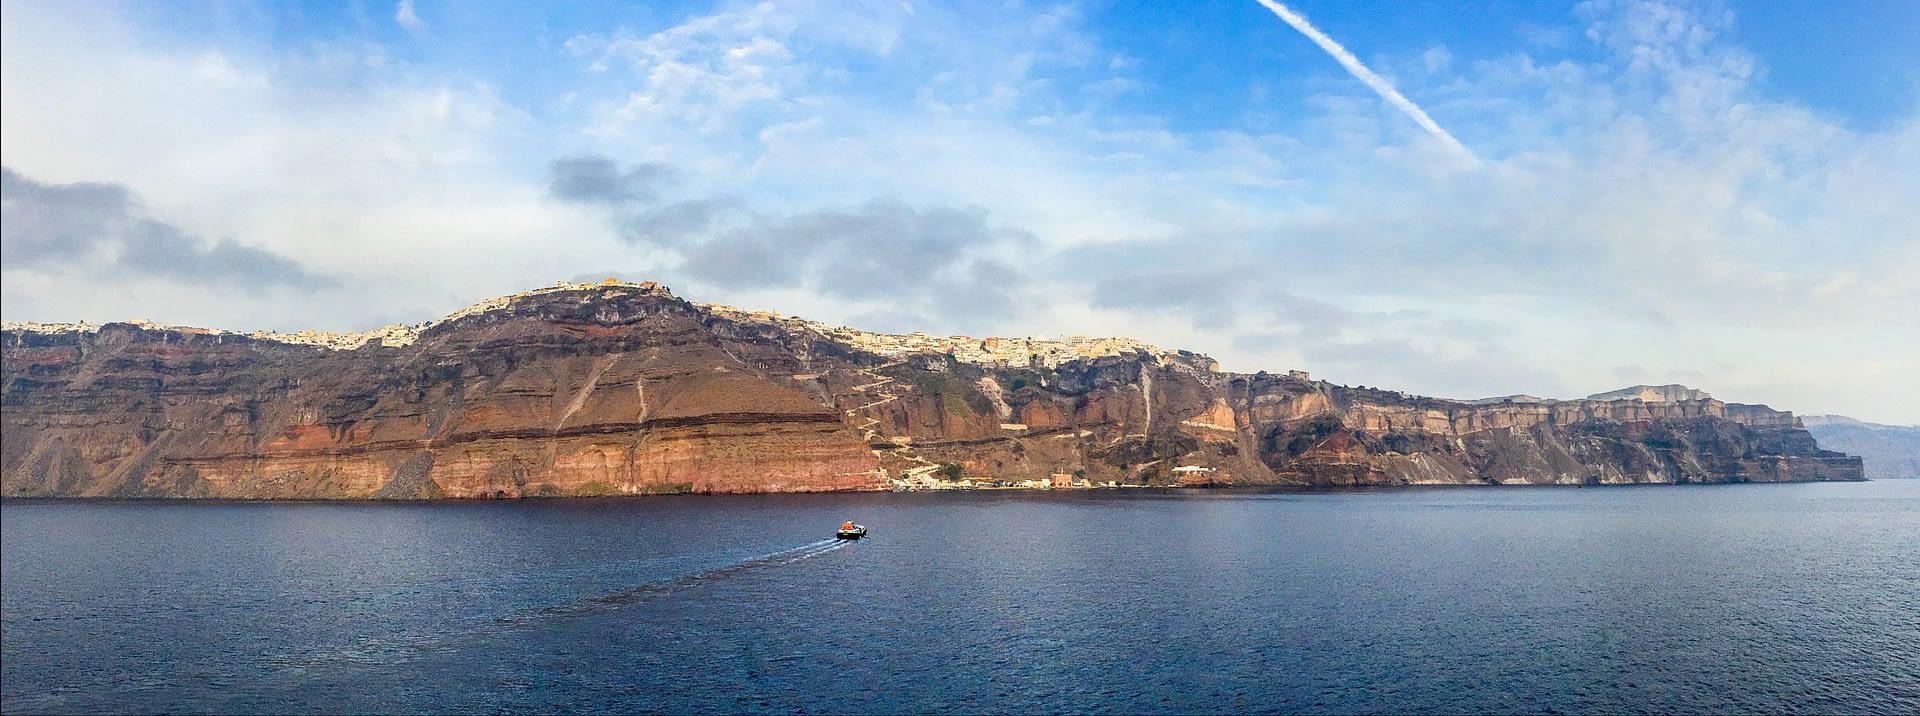 Greece & Montenegro